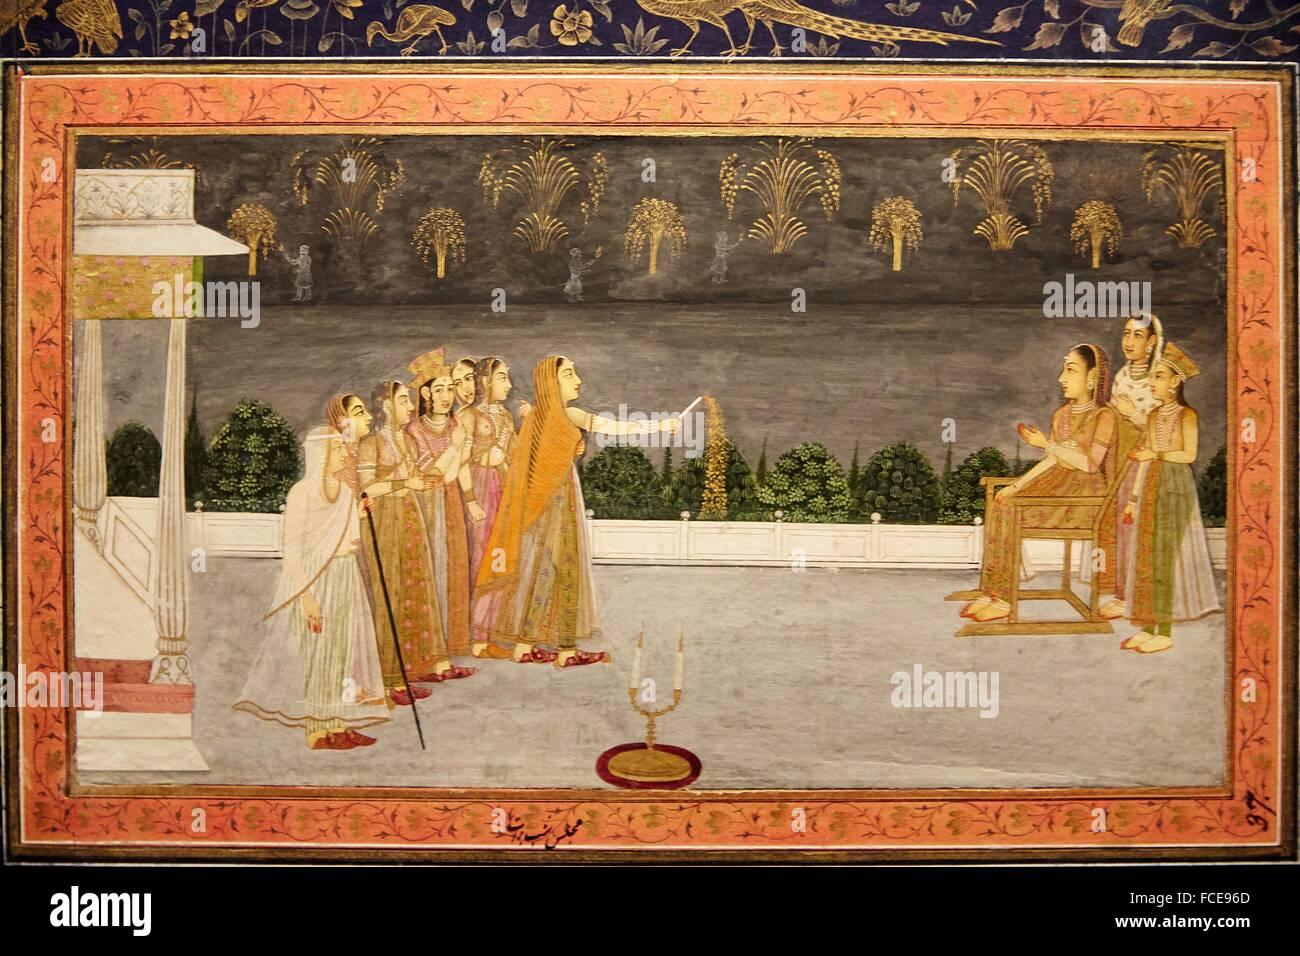 mughal miniature painting islamic art india pergamon museum stock photo royalty free image. Black Bedroom Furniture Sets. Home Design Ideas